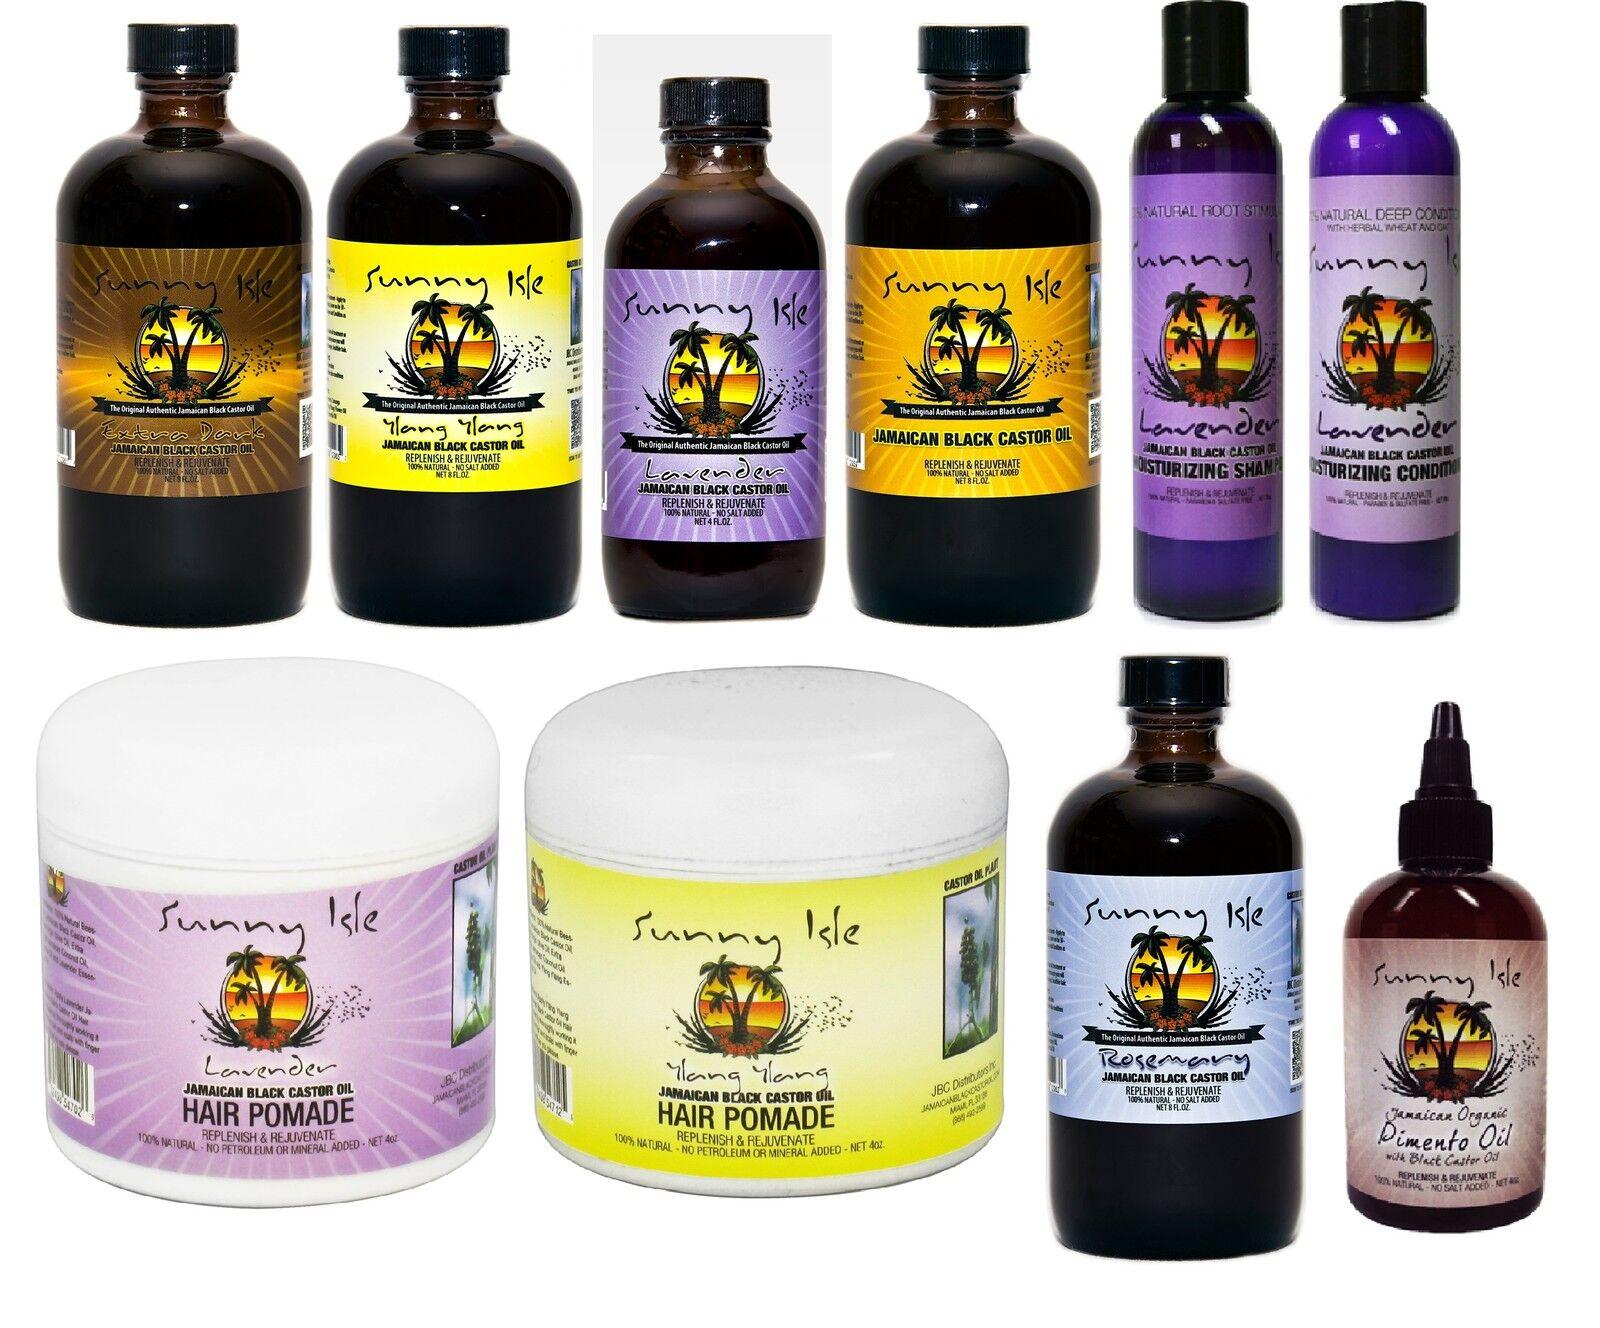 Sunny Isle Jamaican Black Castor Oil With FREE APPLICATOR